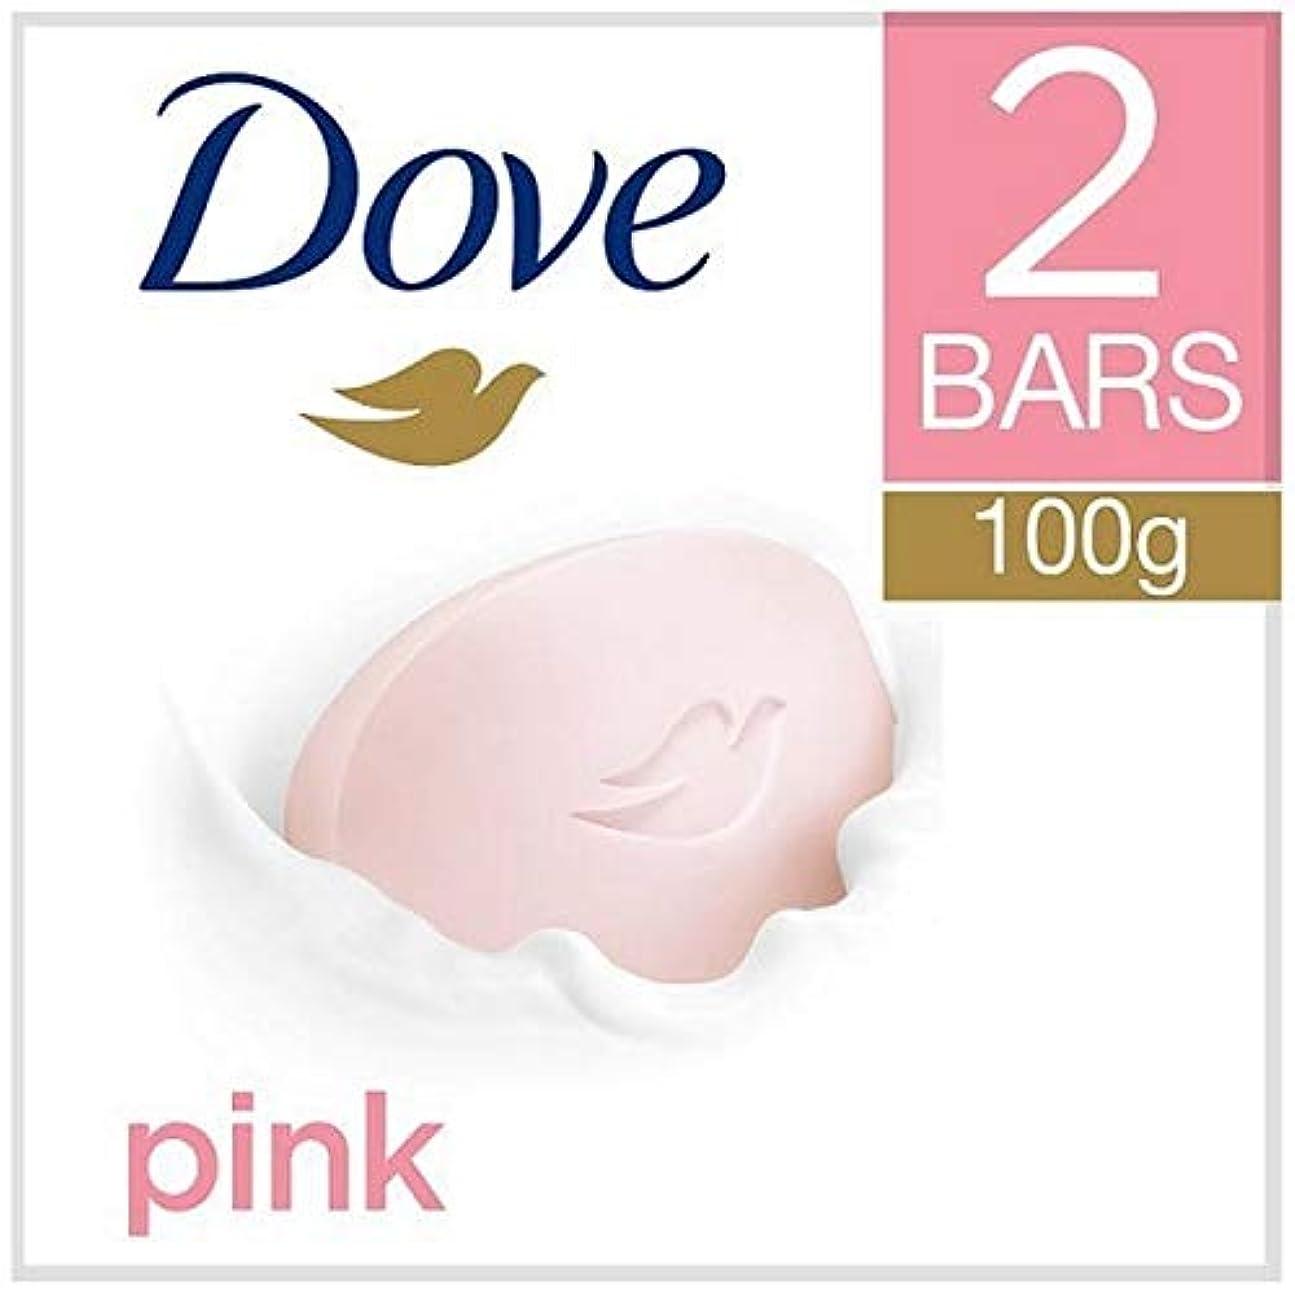 [Dove ] 鳩ピンク美容クリームバー2X100G - Dove Pink Beauty Cream Bar 2x100g [並行輸入品]